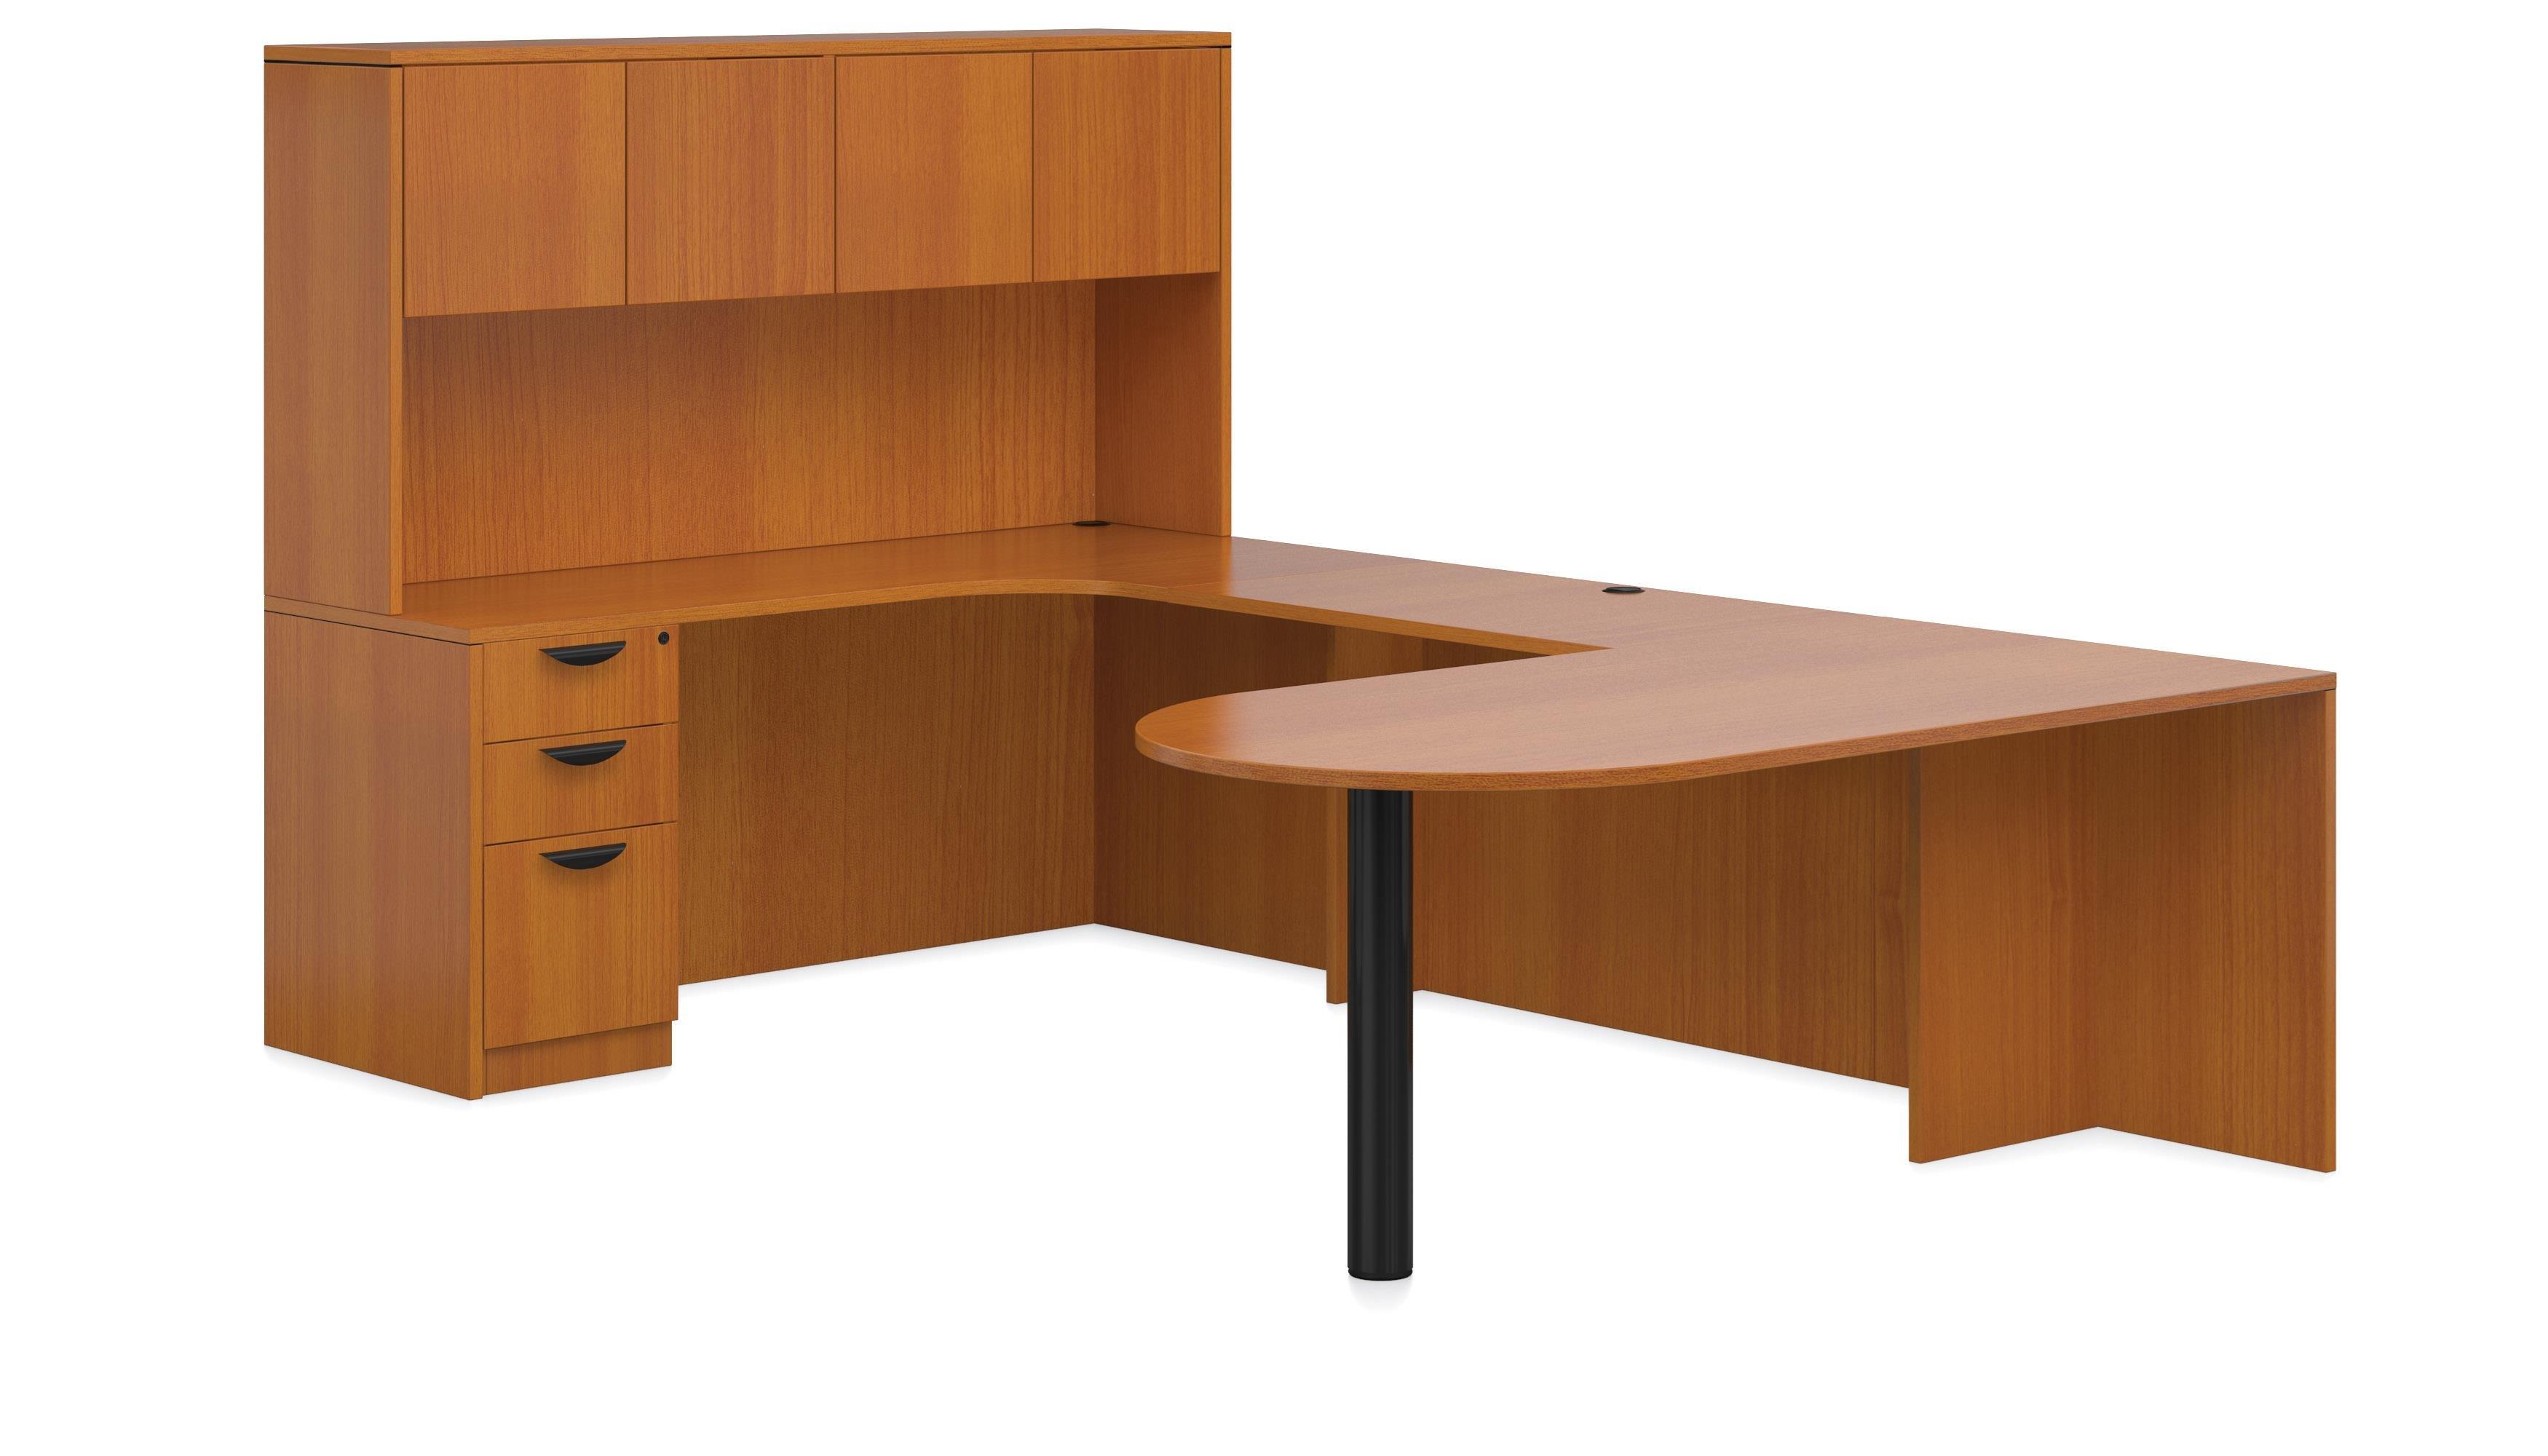 Offices To Go U Shaped Executive Desk W D Island Shaped Penisula